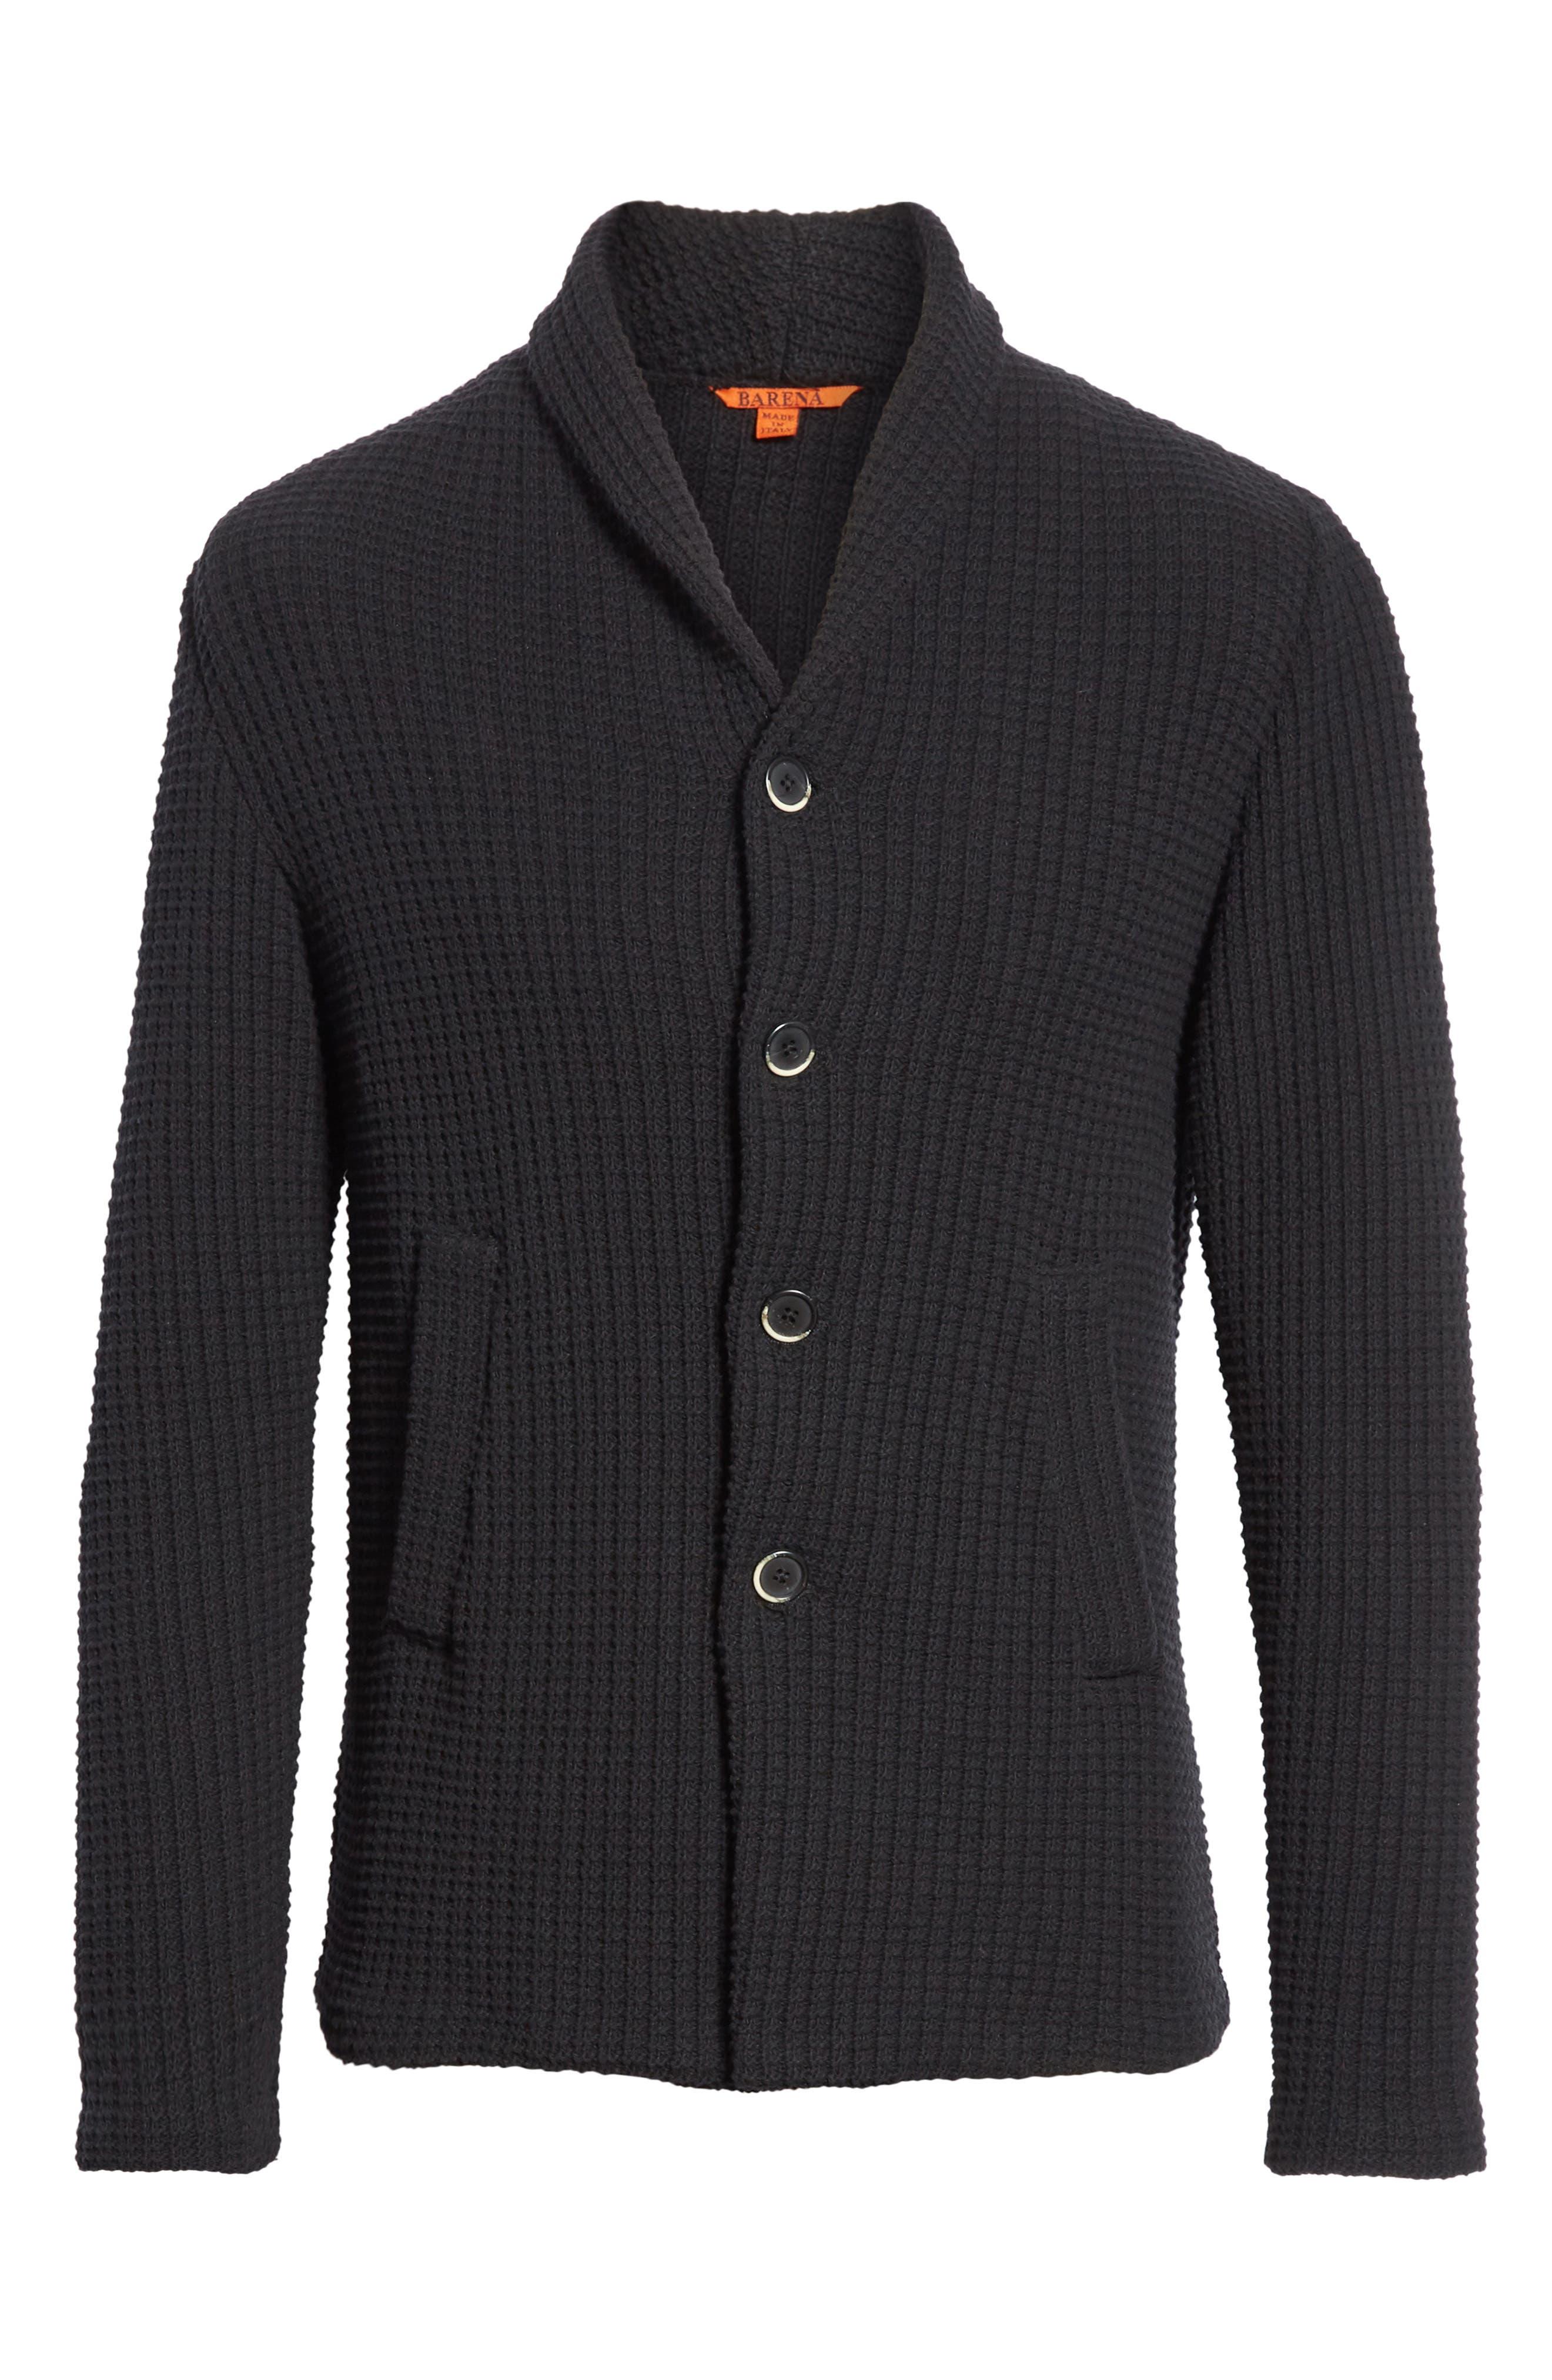 Barena Venzia Lione Badoer Knit Jacket,                             Alternate thumbnail 5, color,                             001